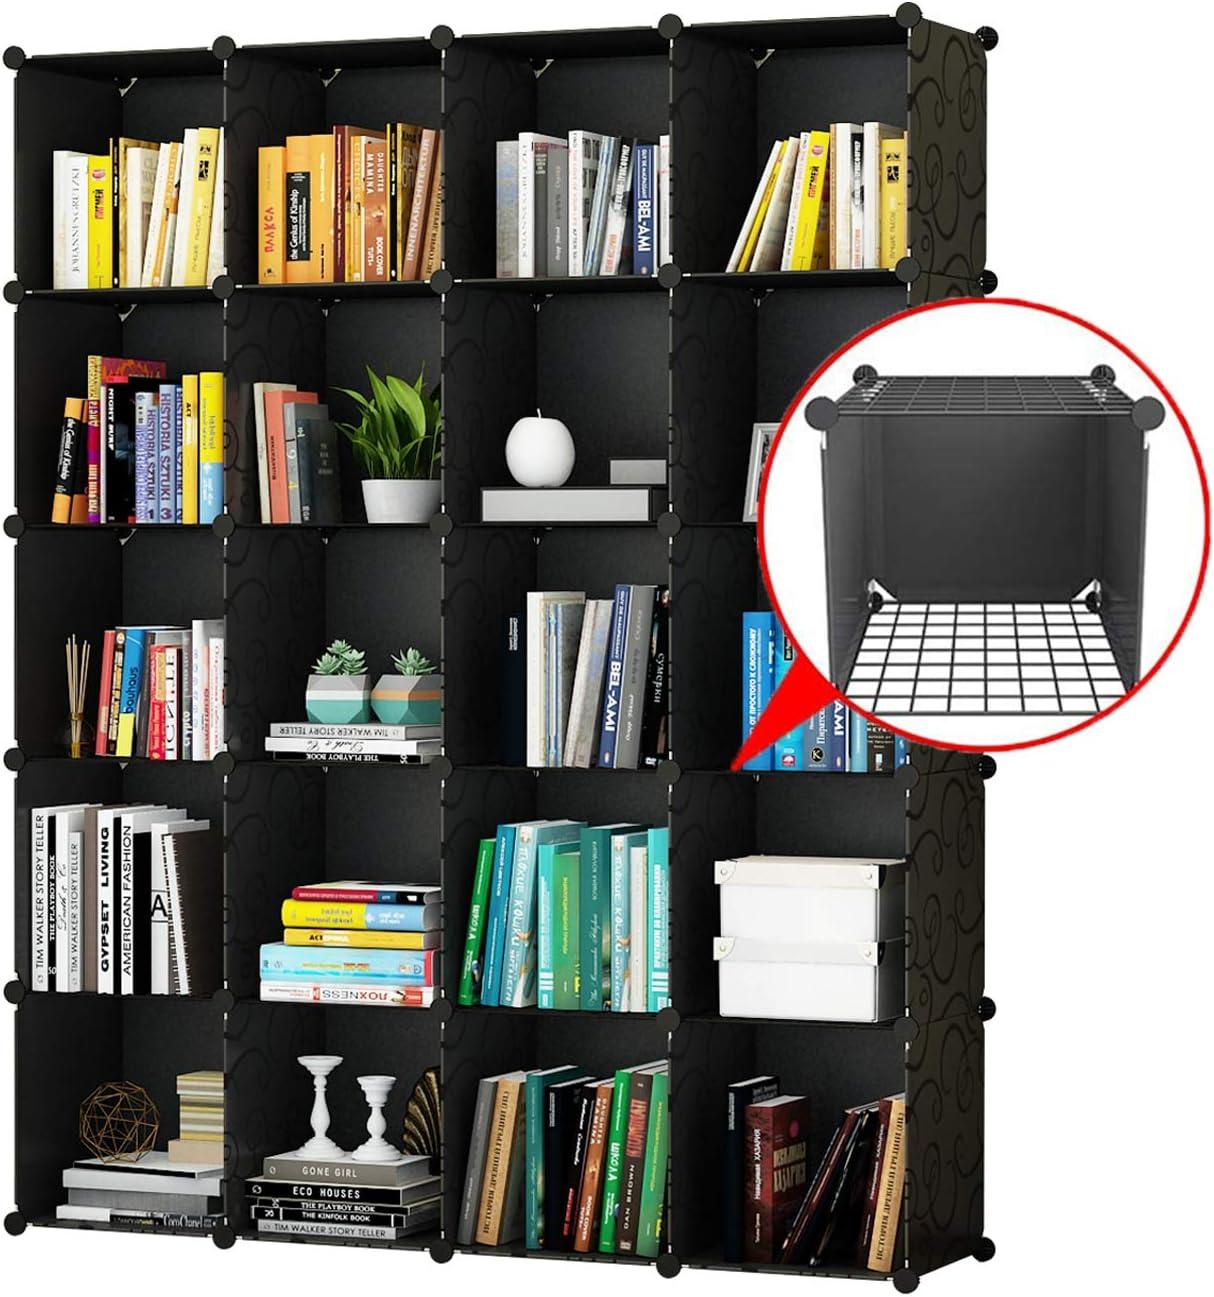 "KOUSI Portable Storage Cubes-14"" x14""(Load-Bearing Metal Panel) Modular Bookshelf Units,Clothes Storage Shelves,Room Organizer"